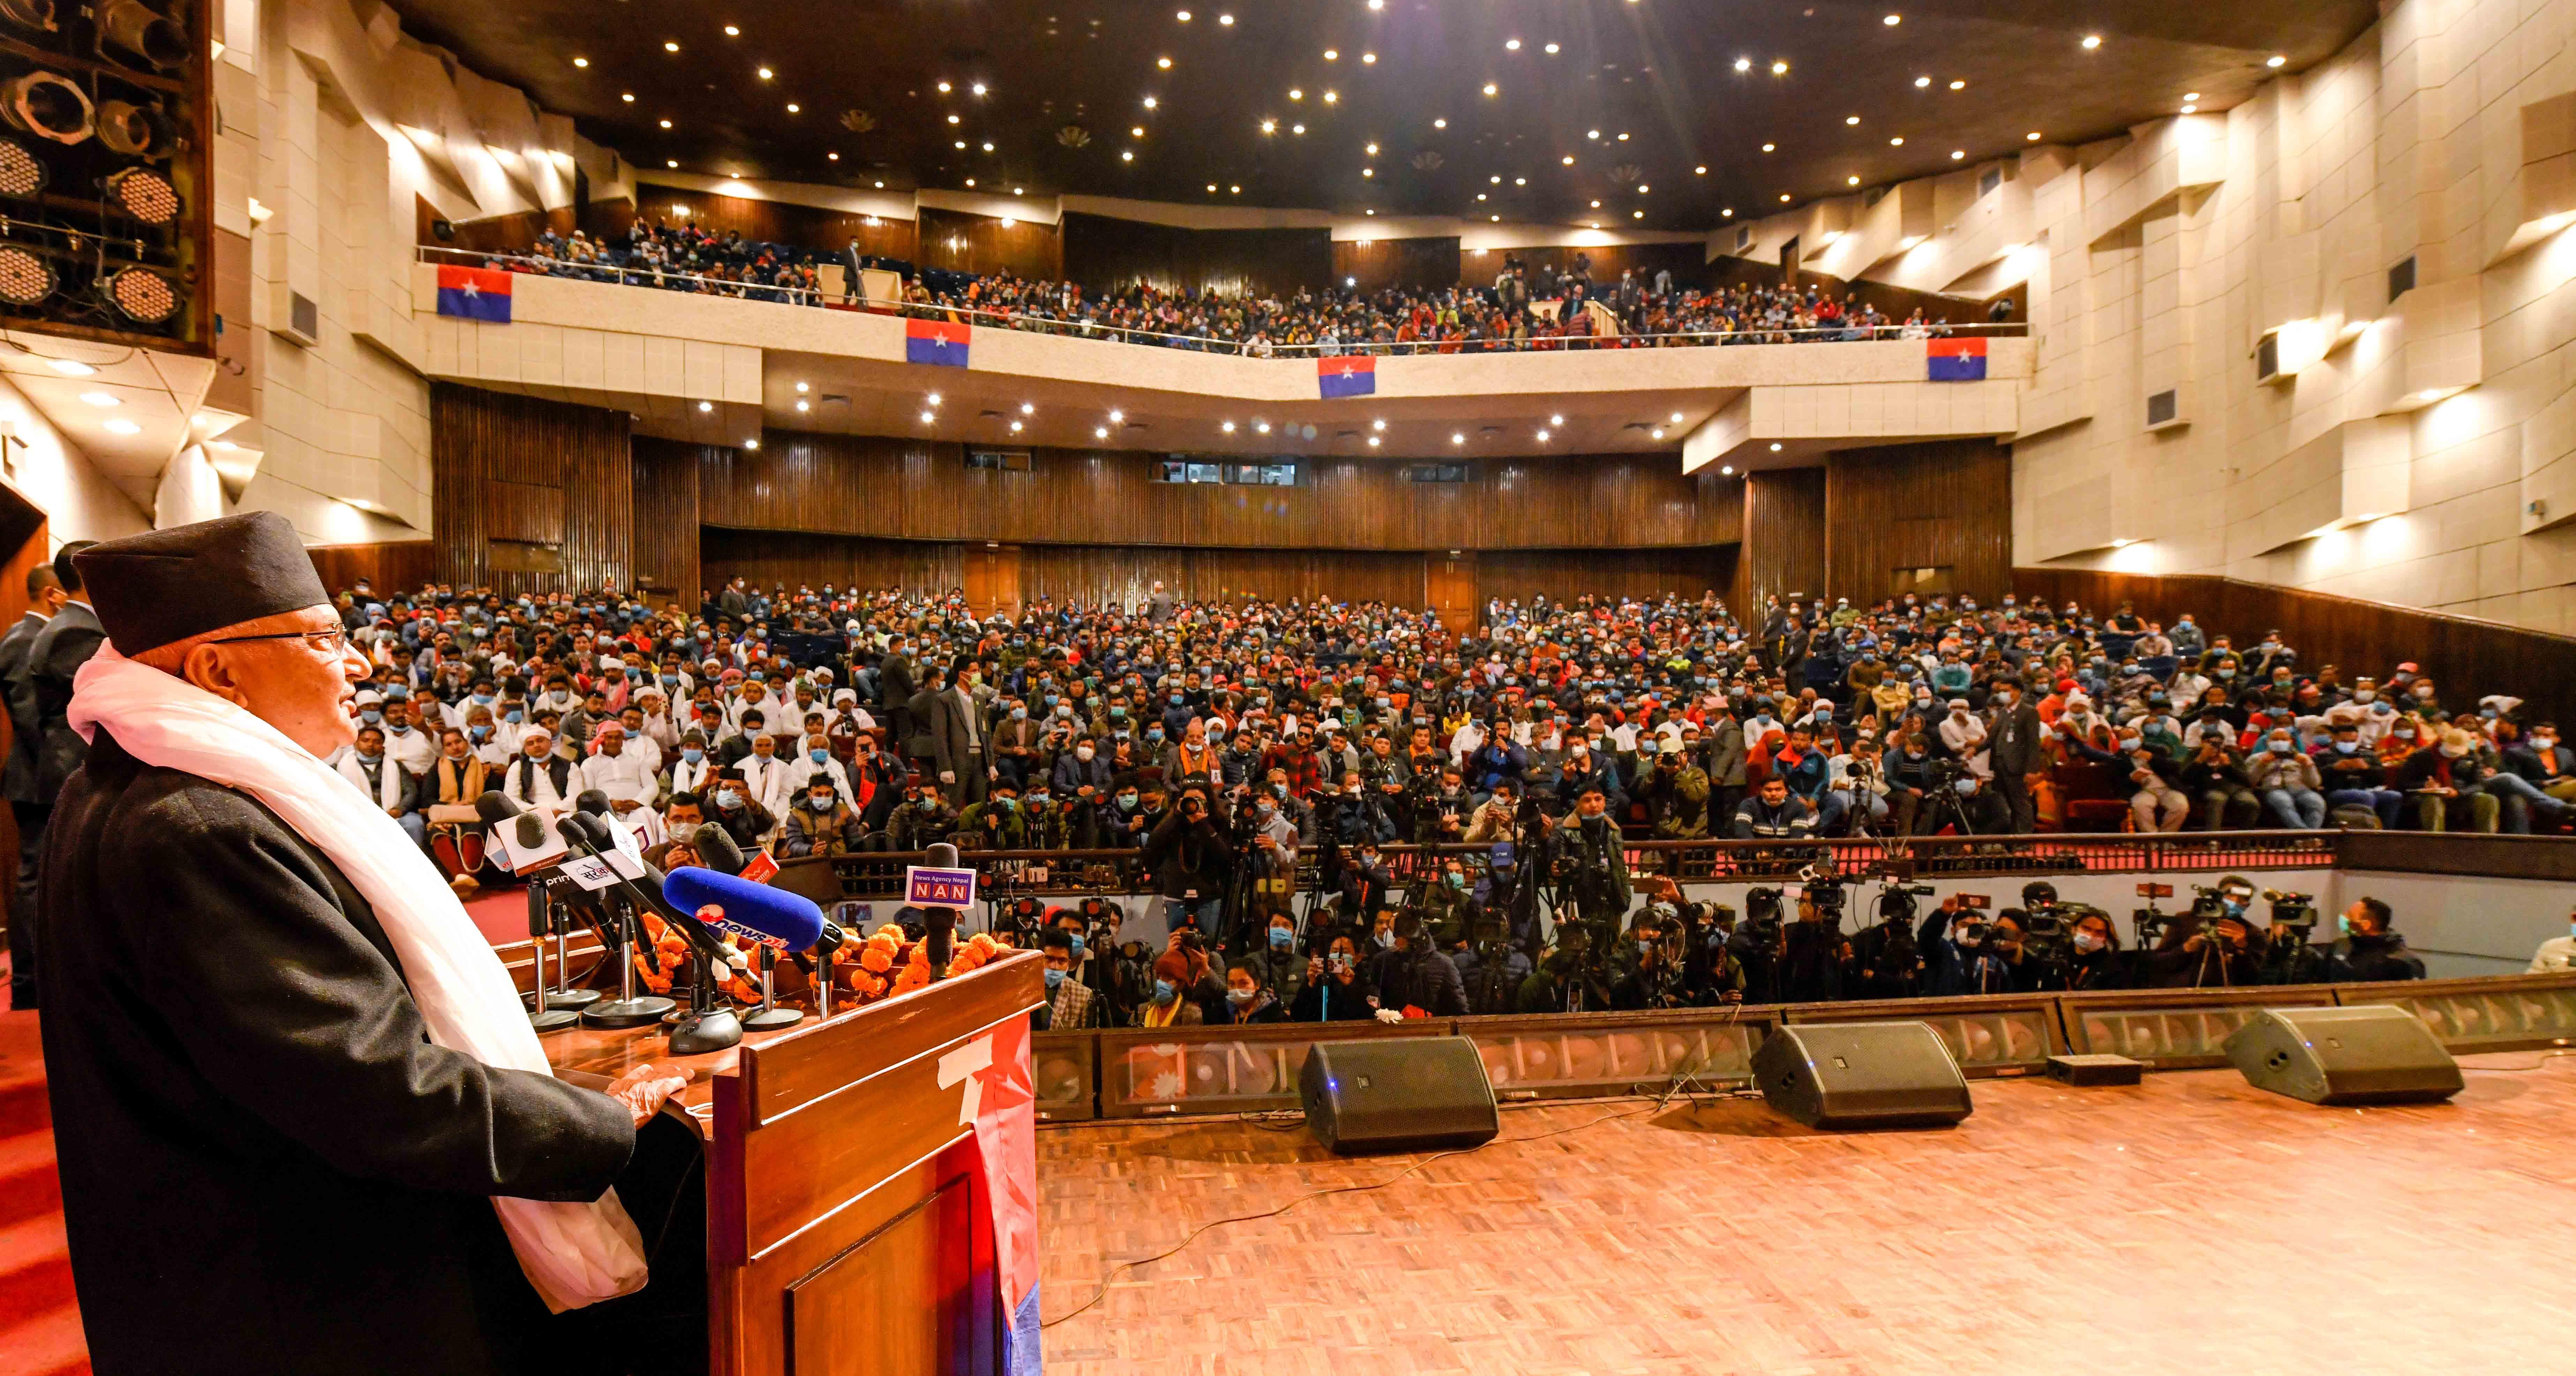 Photo Courtesy: Rajan Kafle/PM's Secretariat